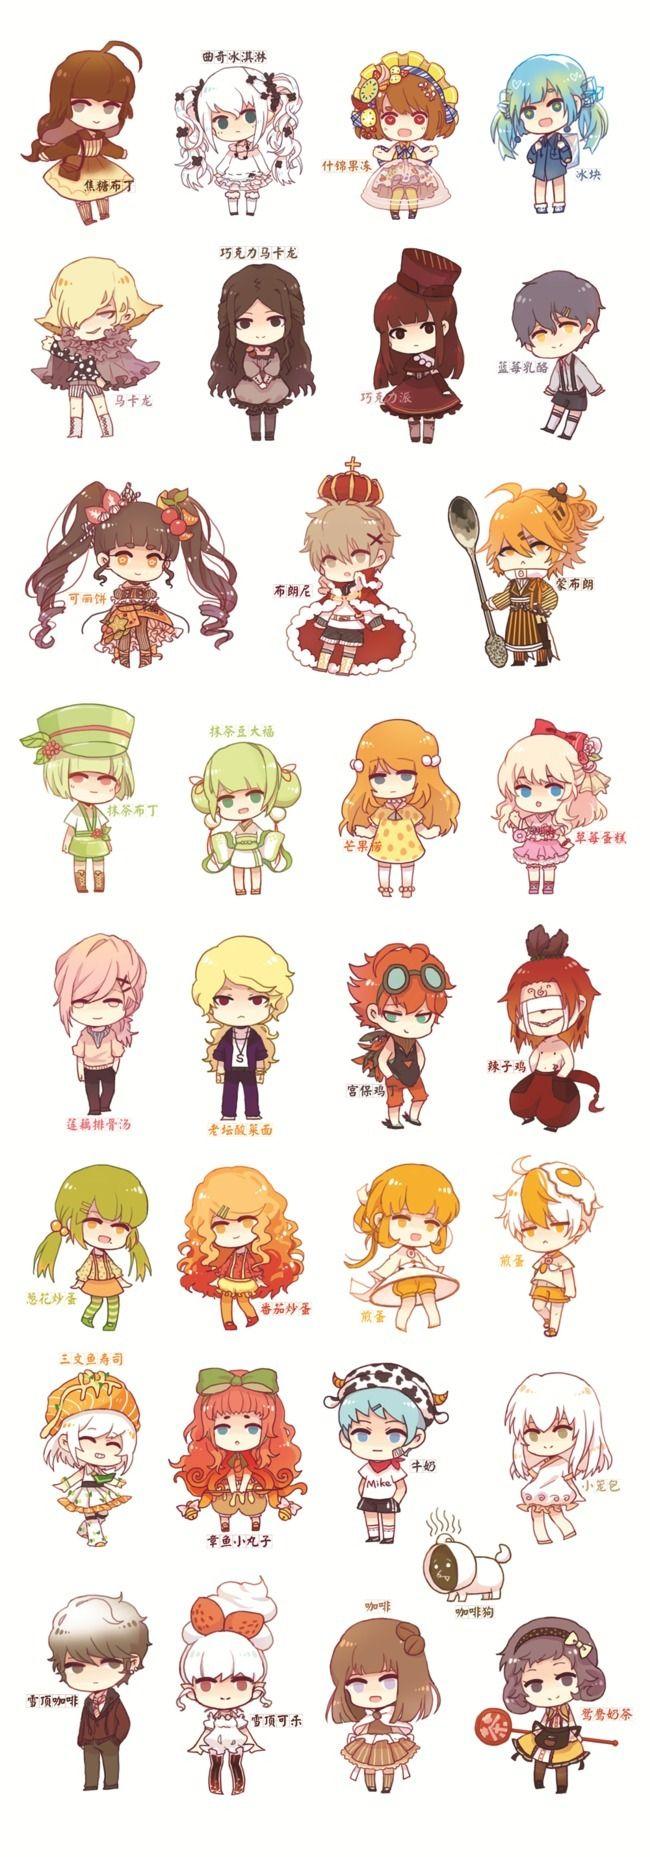 chibi anime illustration